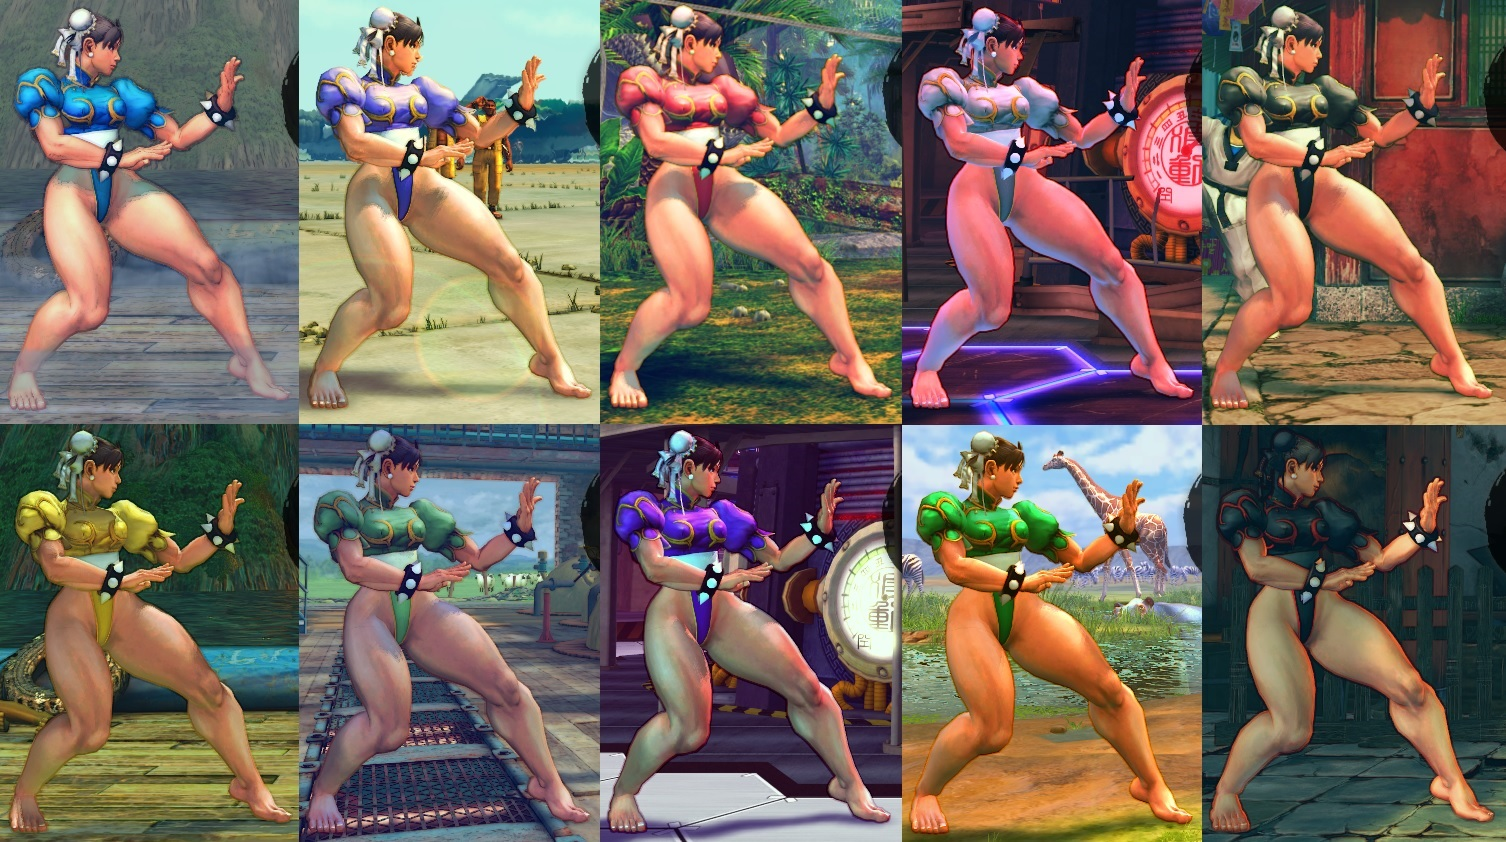 Ultra Street Fighter IV - Screenshots (NSFW) - Adult